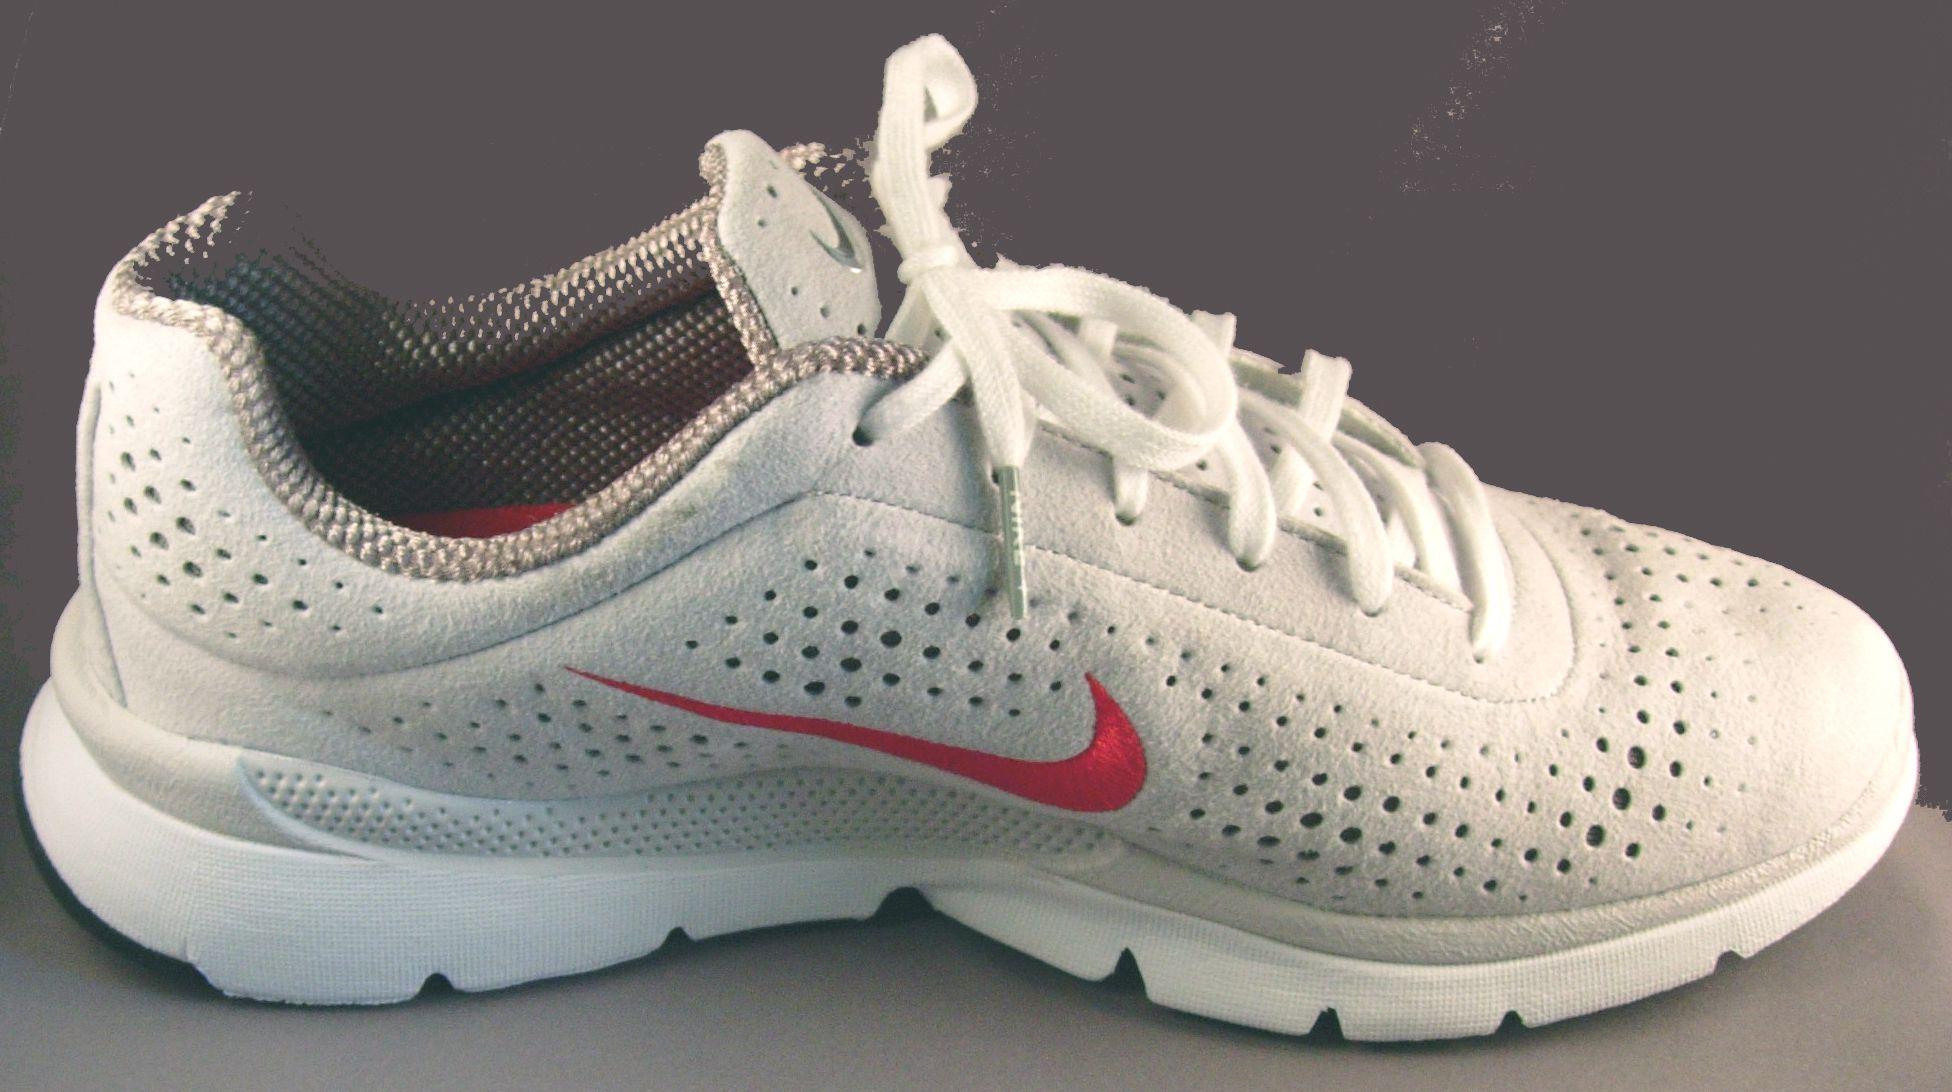 72d0d0e9cc82dc Pouches and Shoes for the Nike+ Sensor